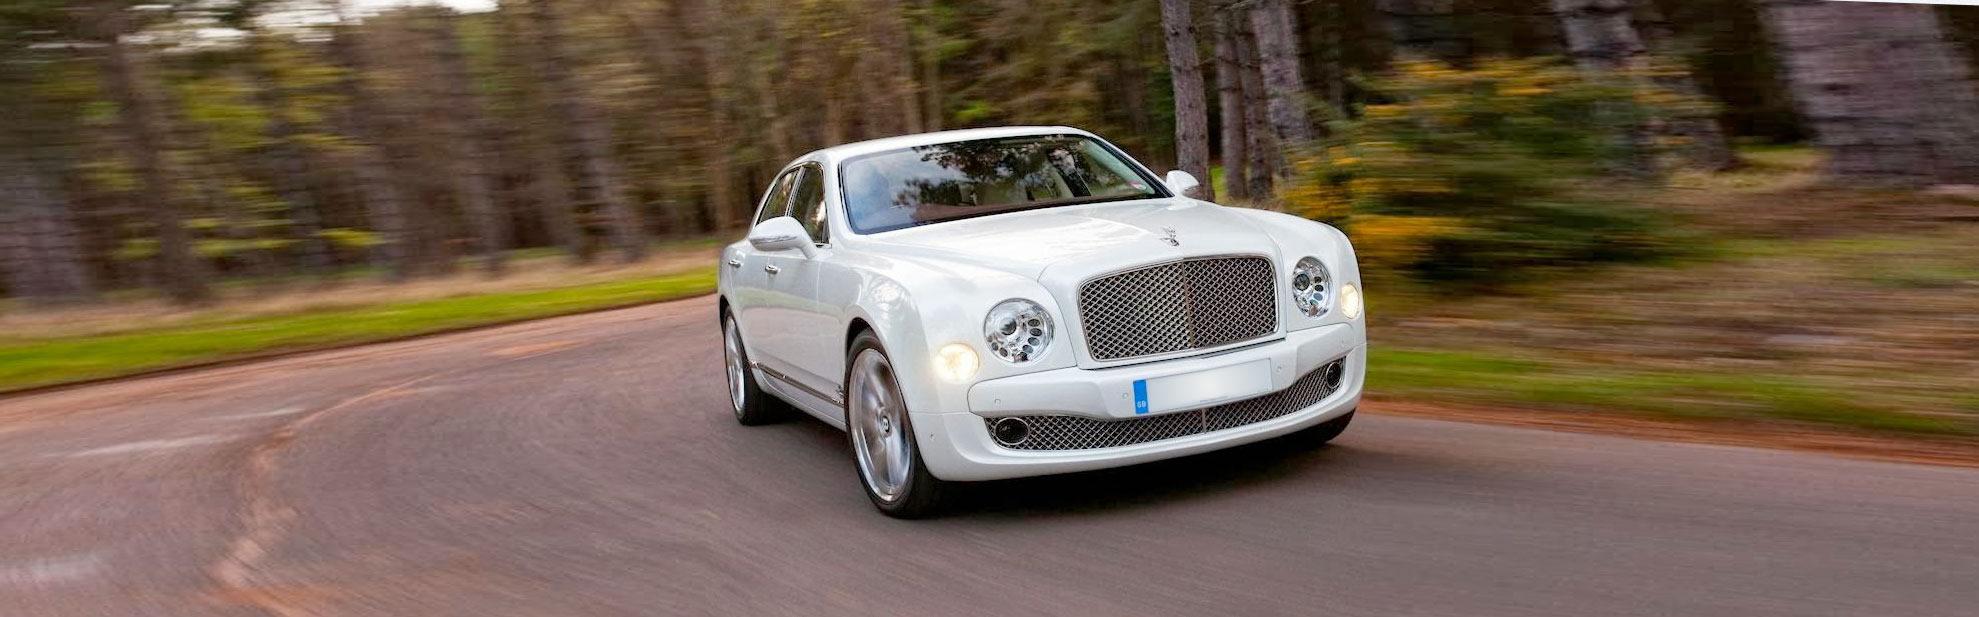 white Bentley Mulsanne hire